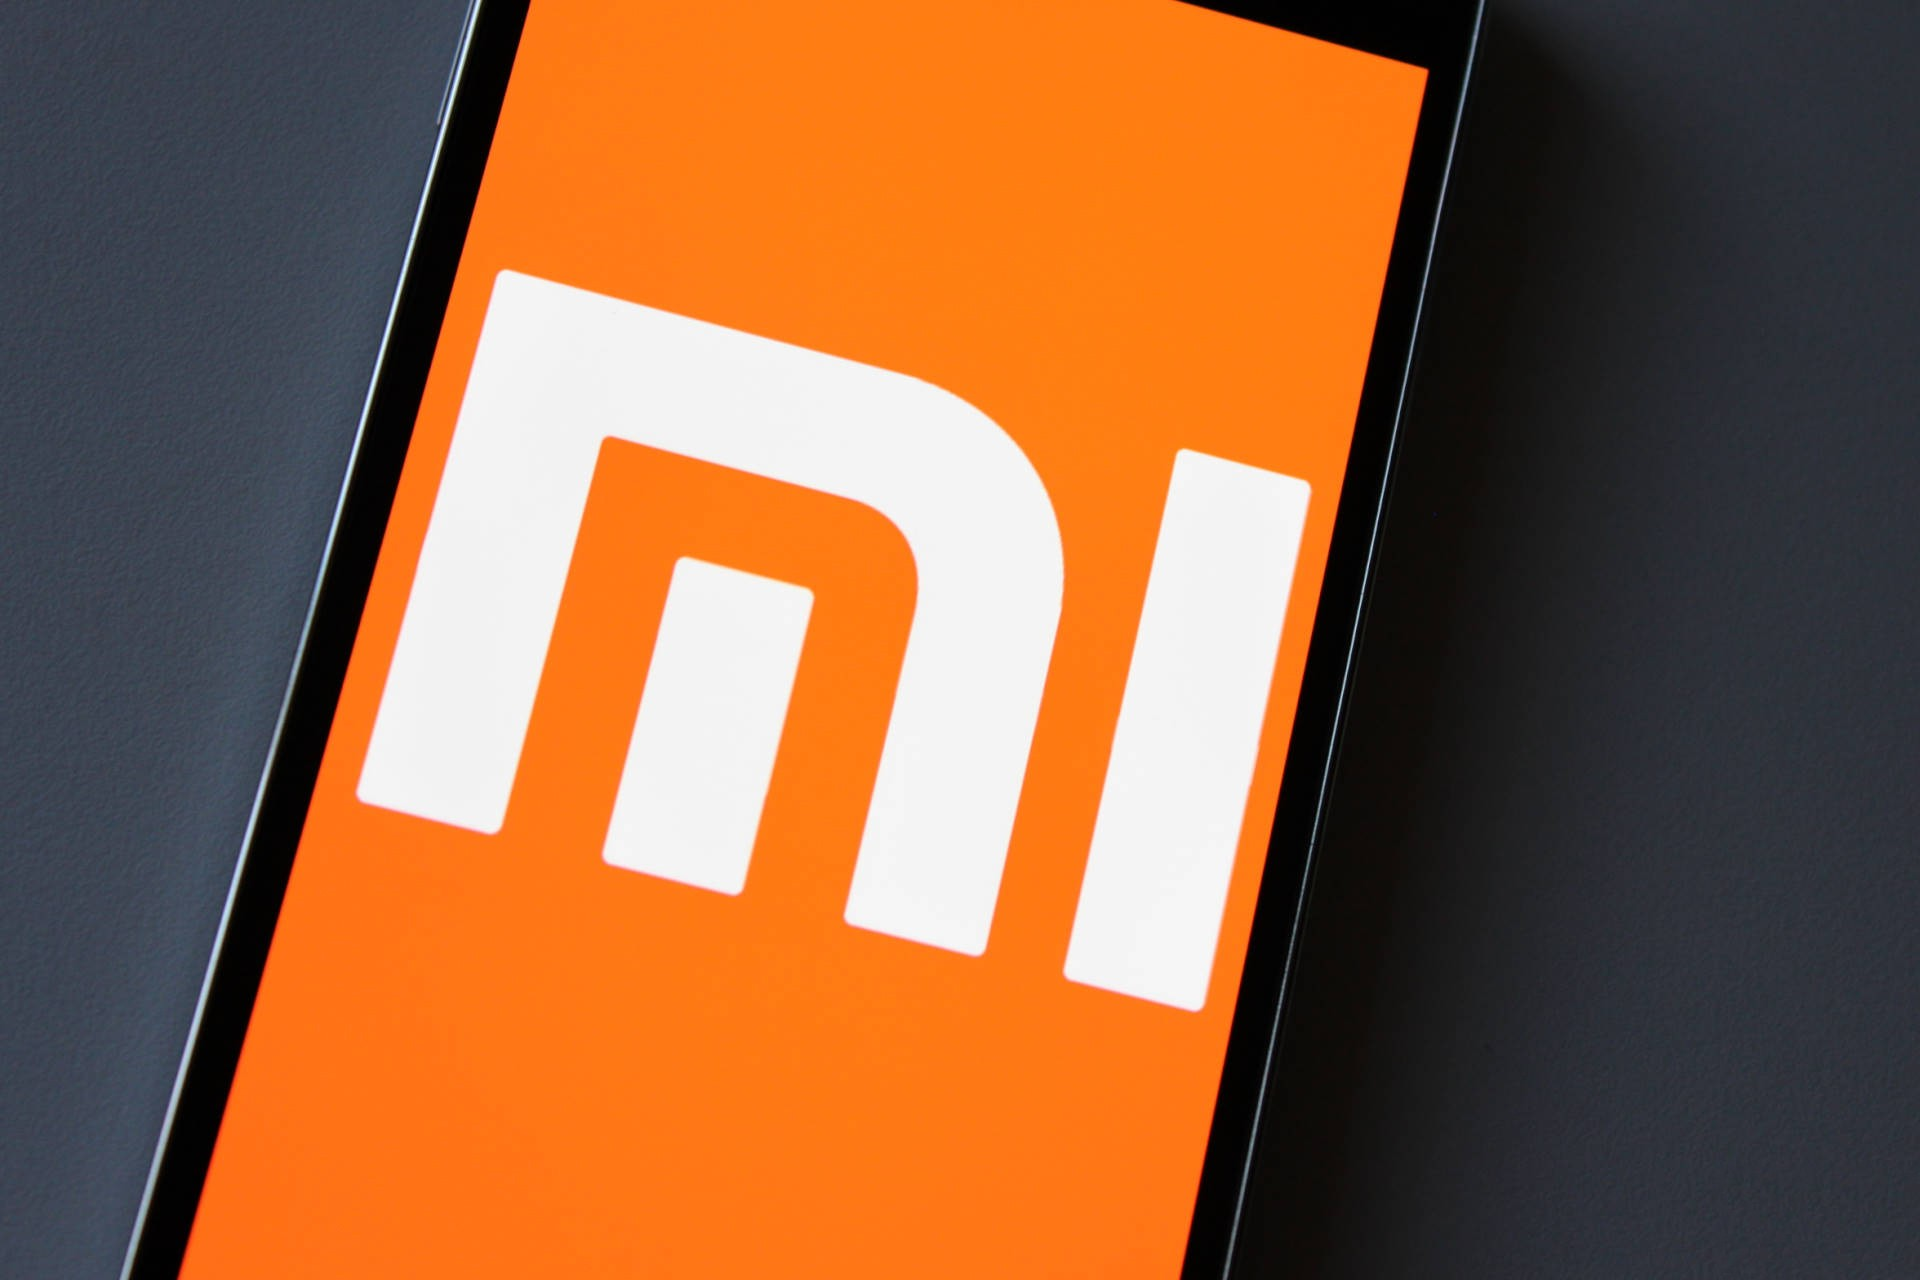 4марта стартуют продажи Xiaomi Redmi Note 4